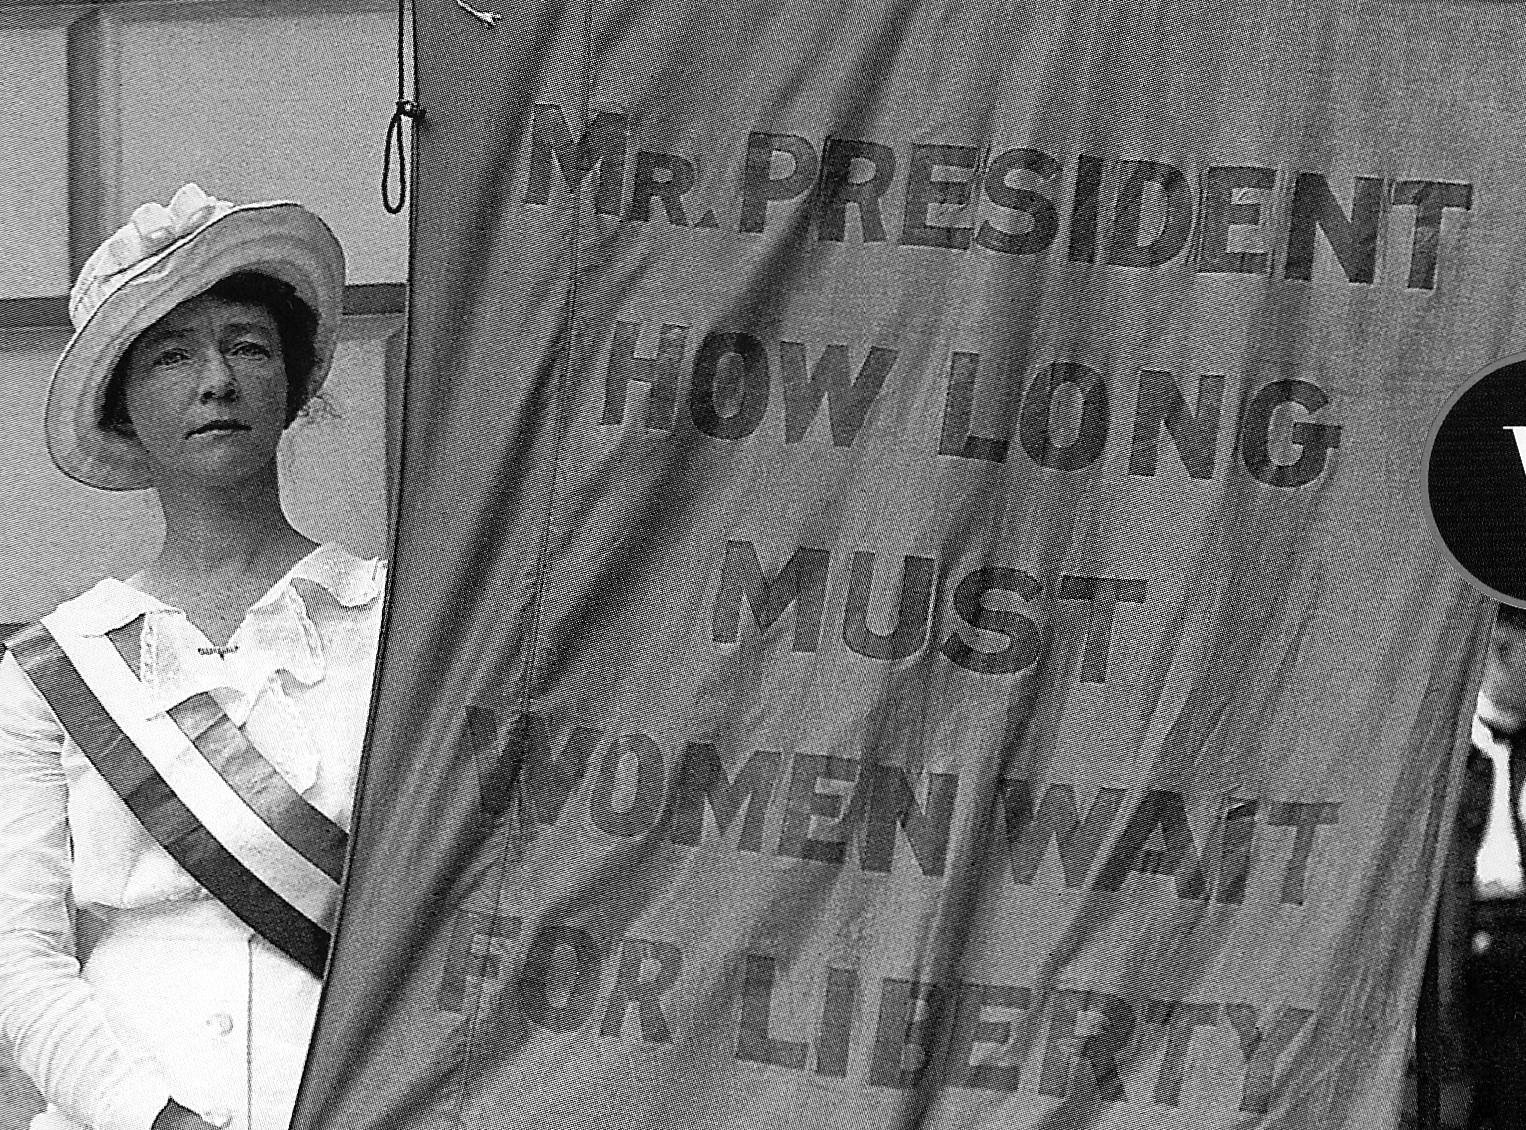 90 years ago. . .